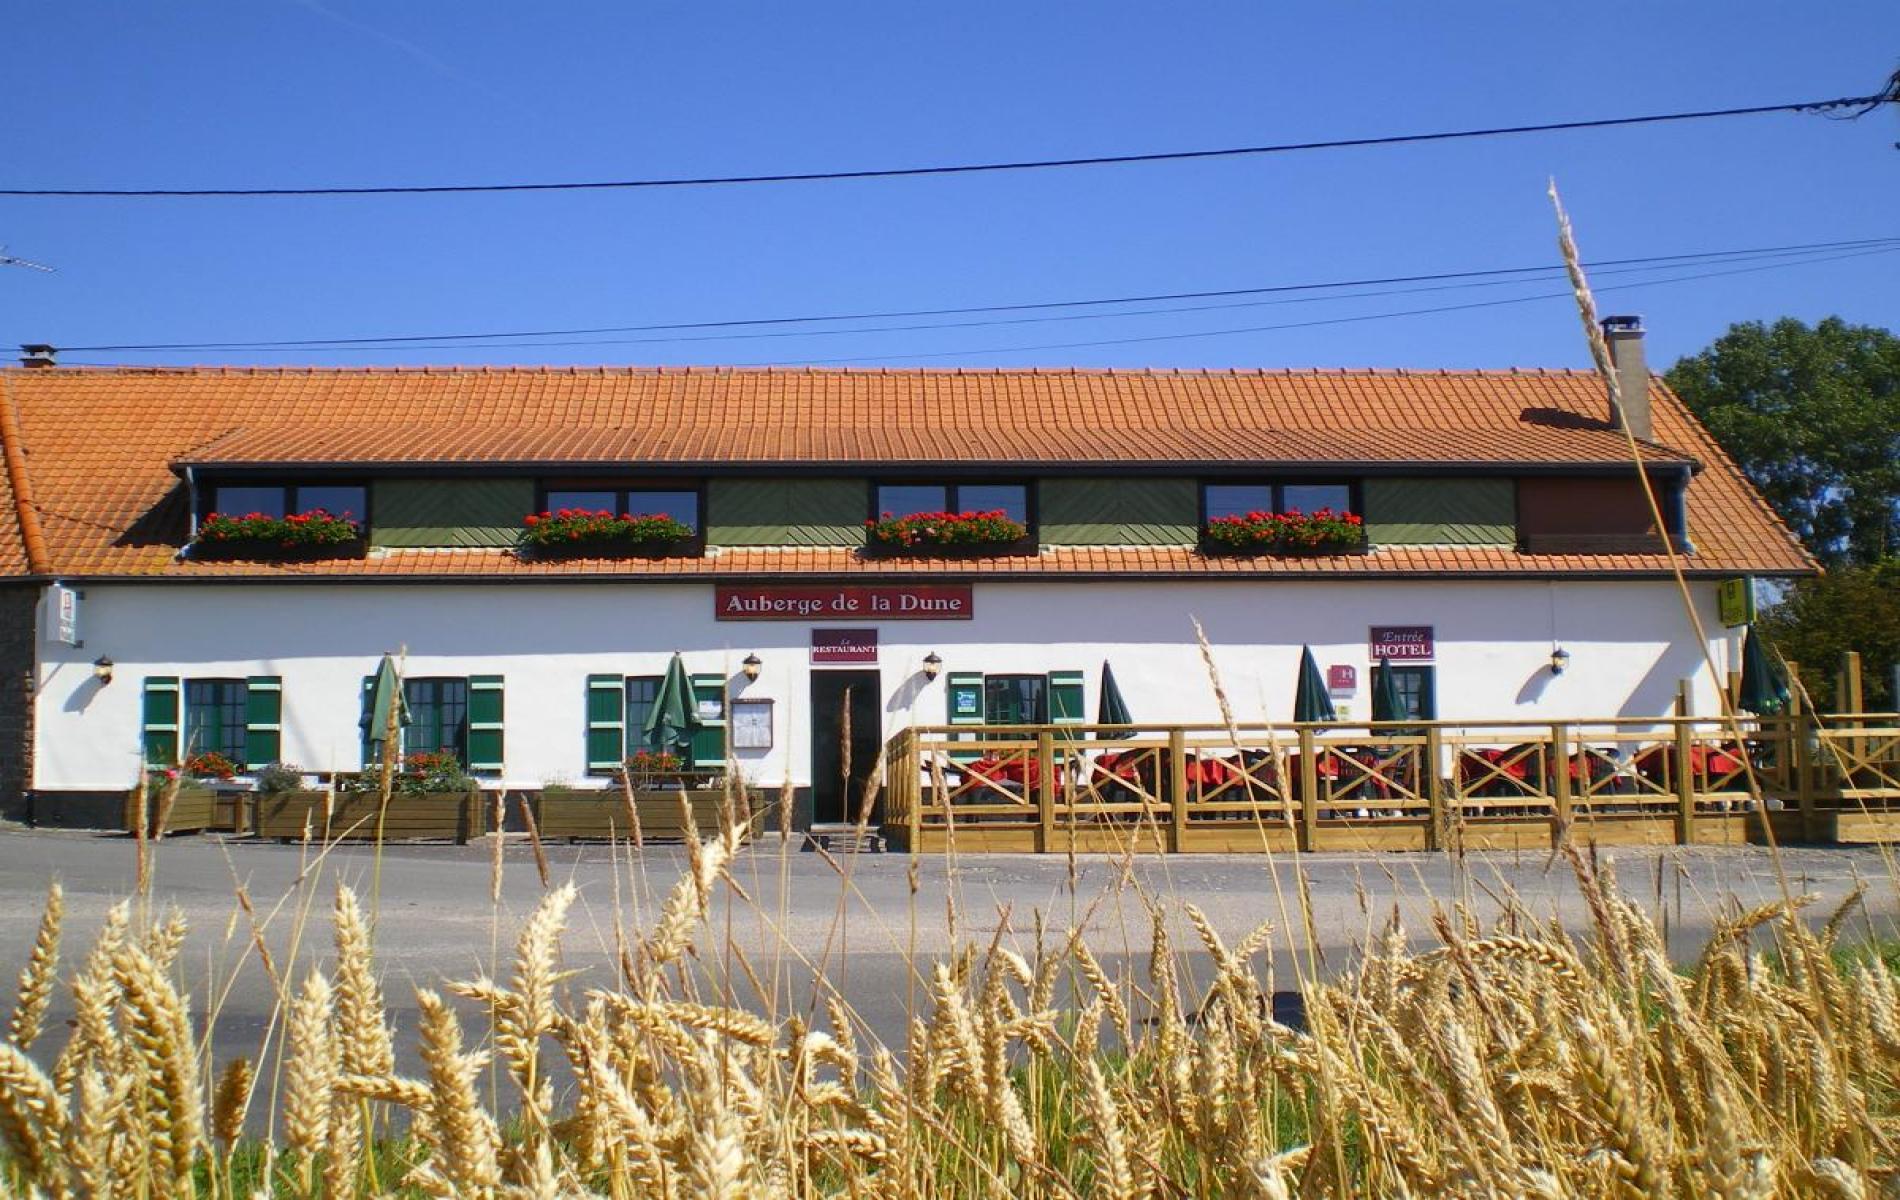 Auberge De La Dune ∞ french picardie hotel restaurant auberge de la dune, near dieppe